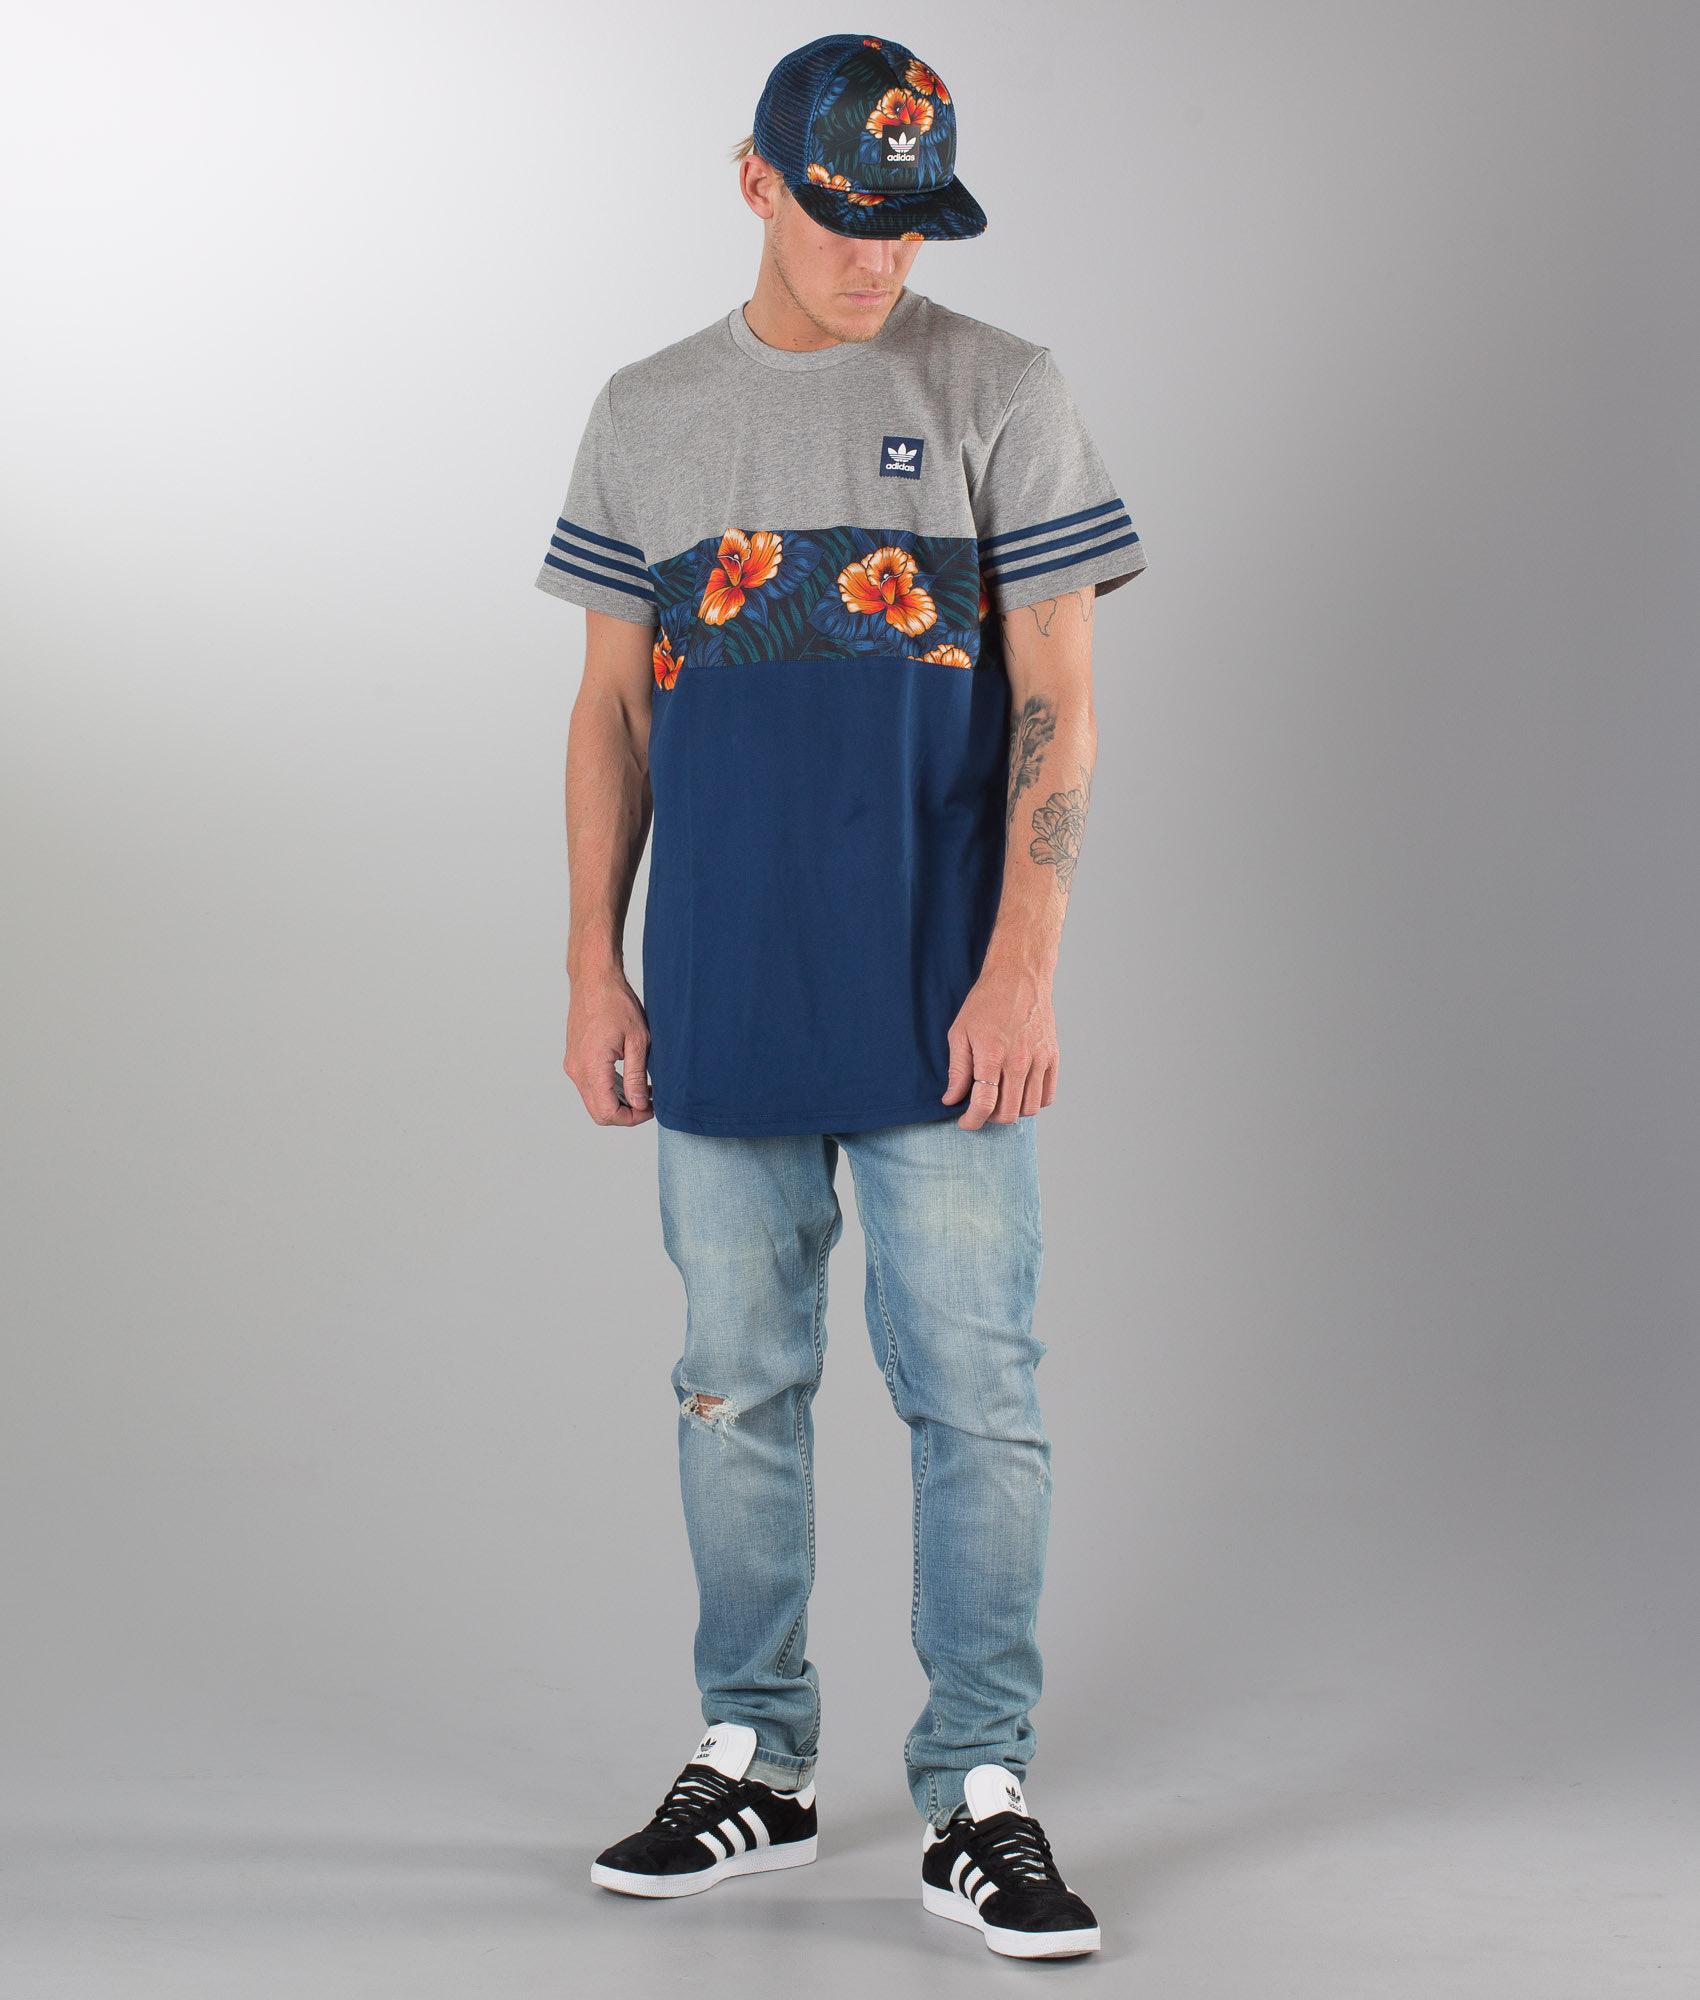 cbf2aadd1 Adidas Skateboarding Sweet Leaf Blocked T-shirt Corhtr/Mysblu/Multco ...